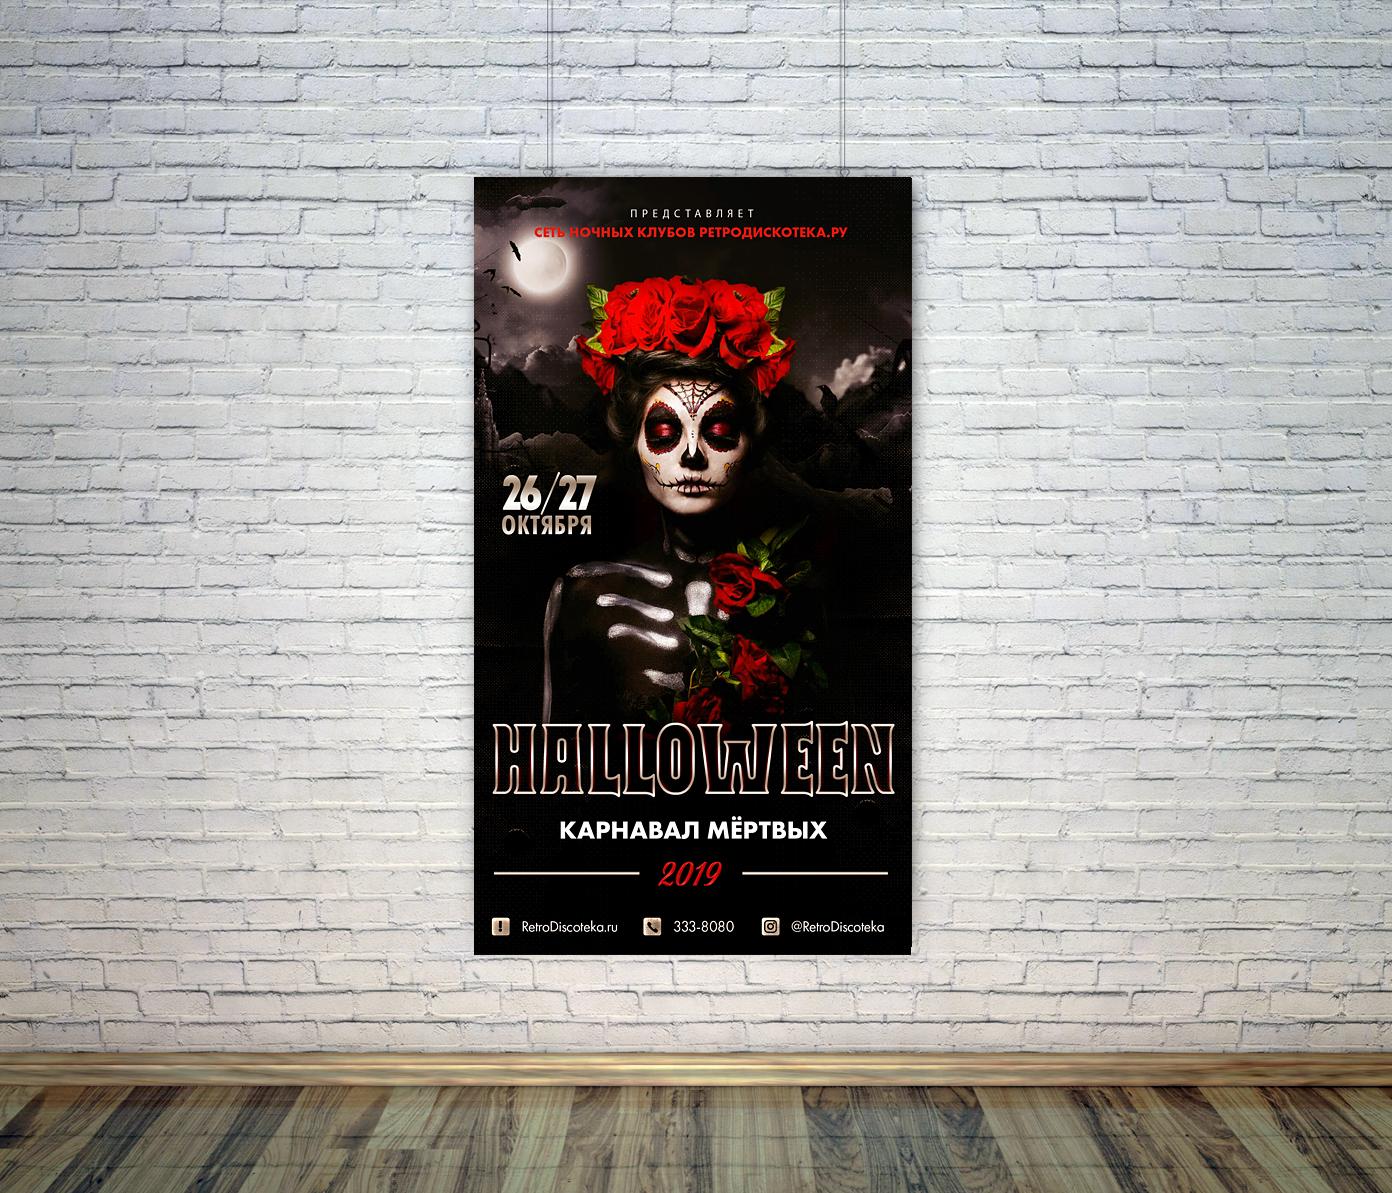 Дизайн афиши Хэллоуин 2019 для сети ночных клубов фото f_7315c6f028a772e6.jpg